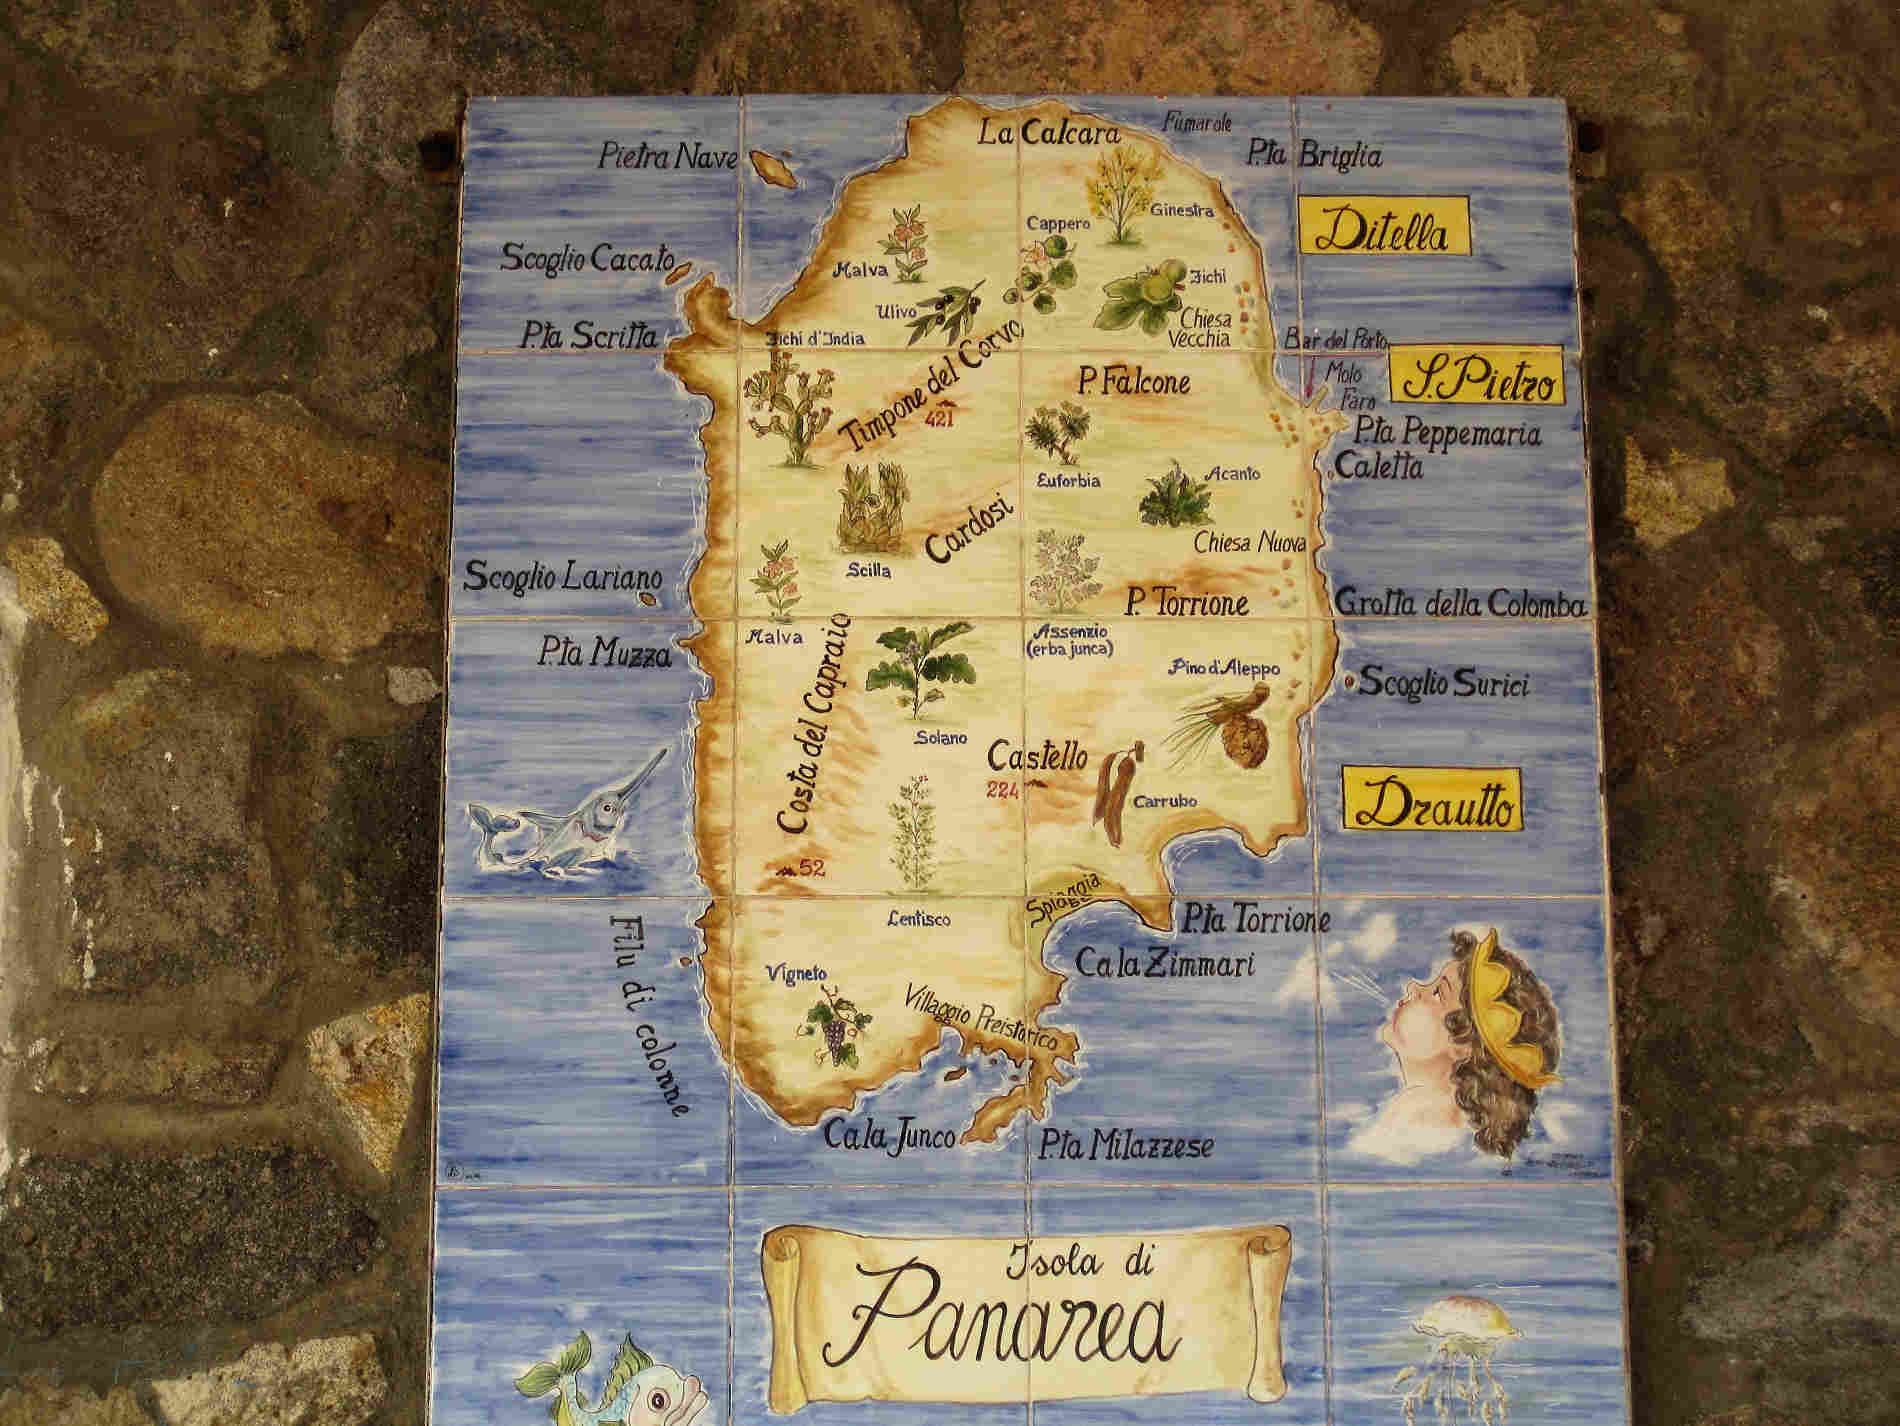 mappa Isola di Panarea Isole Eolie